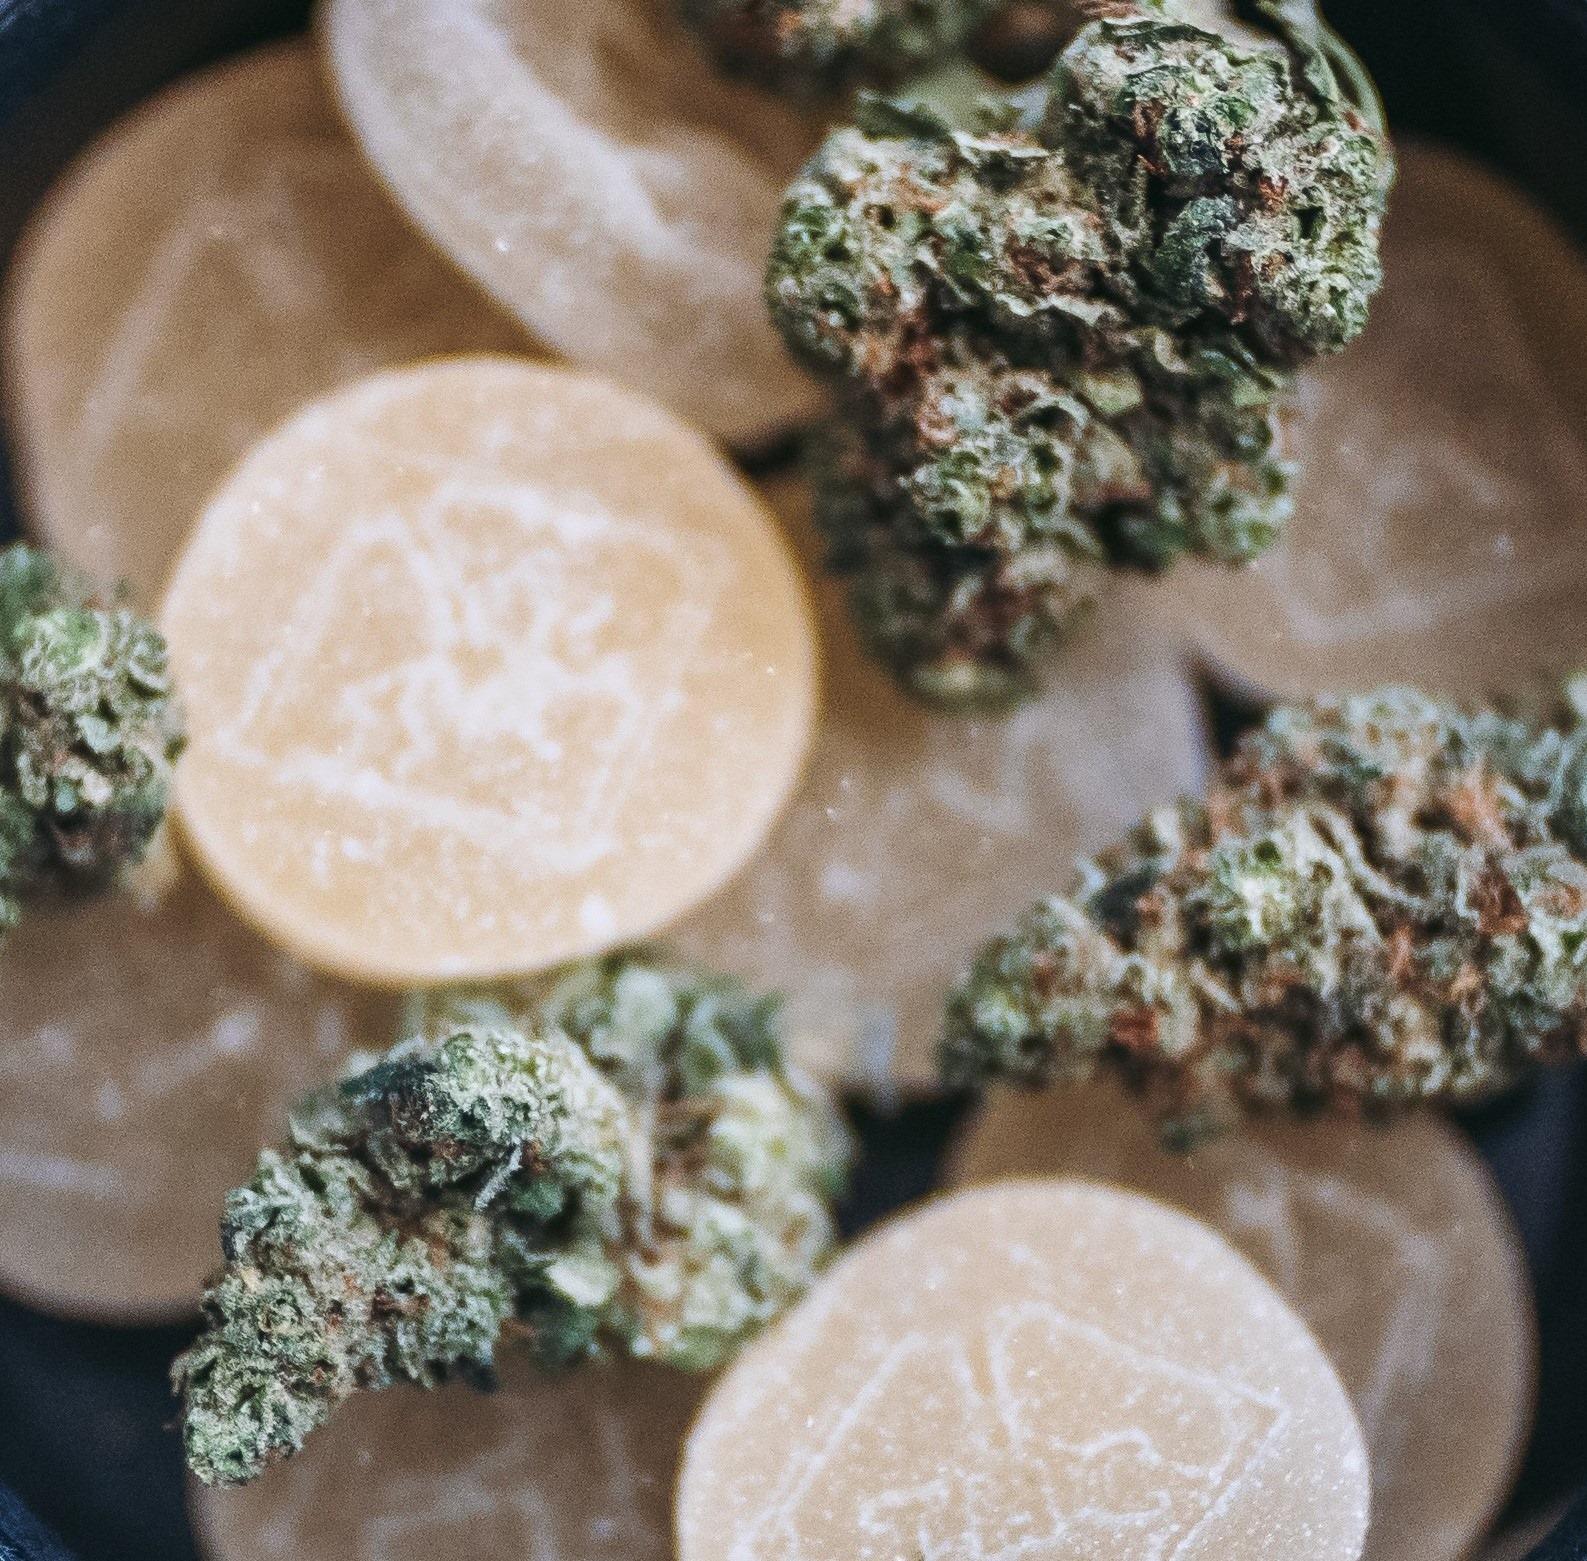 FLUENT Cannabis Dispensary - Panama City